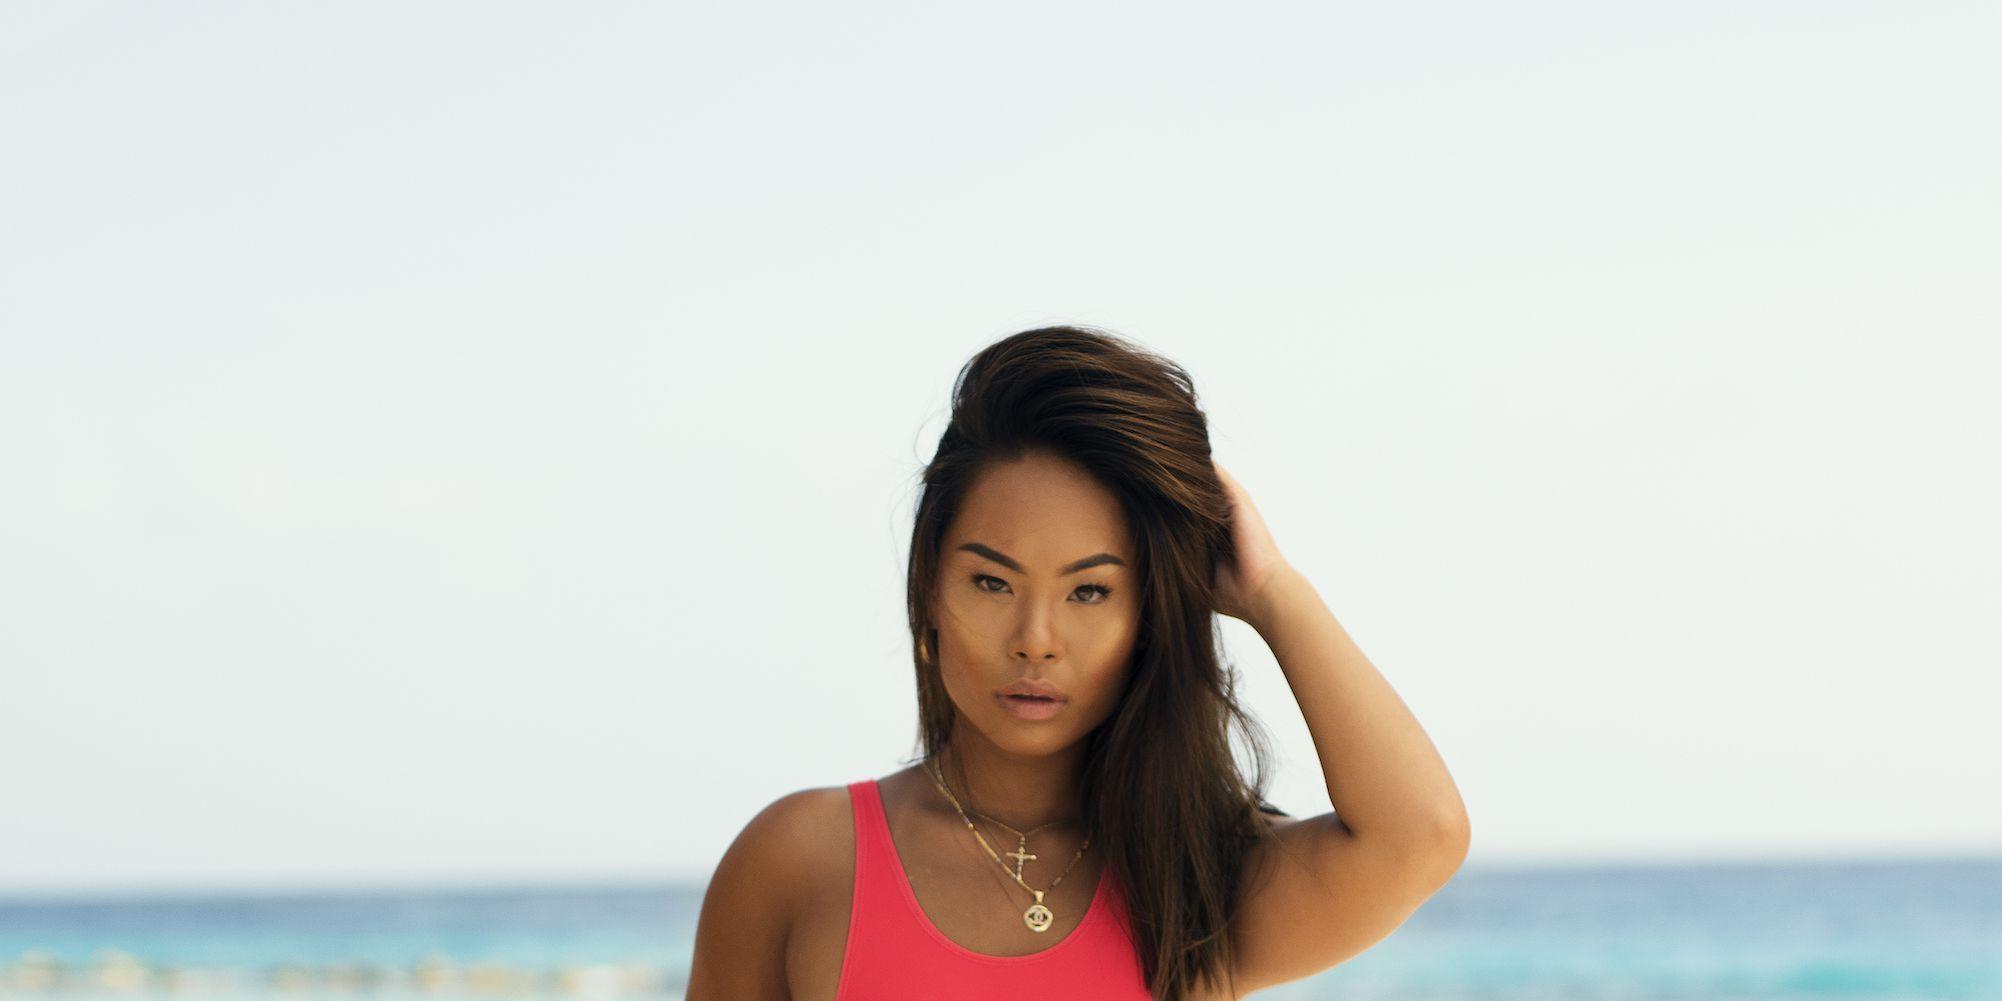 lena-ex-on-the-beach-nieuwe-vriend